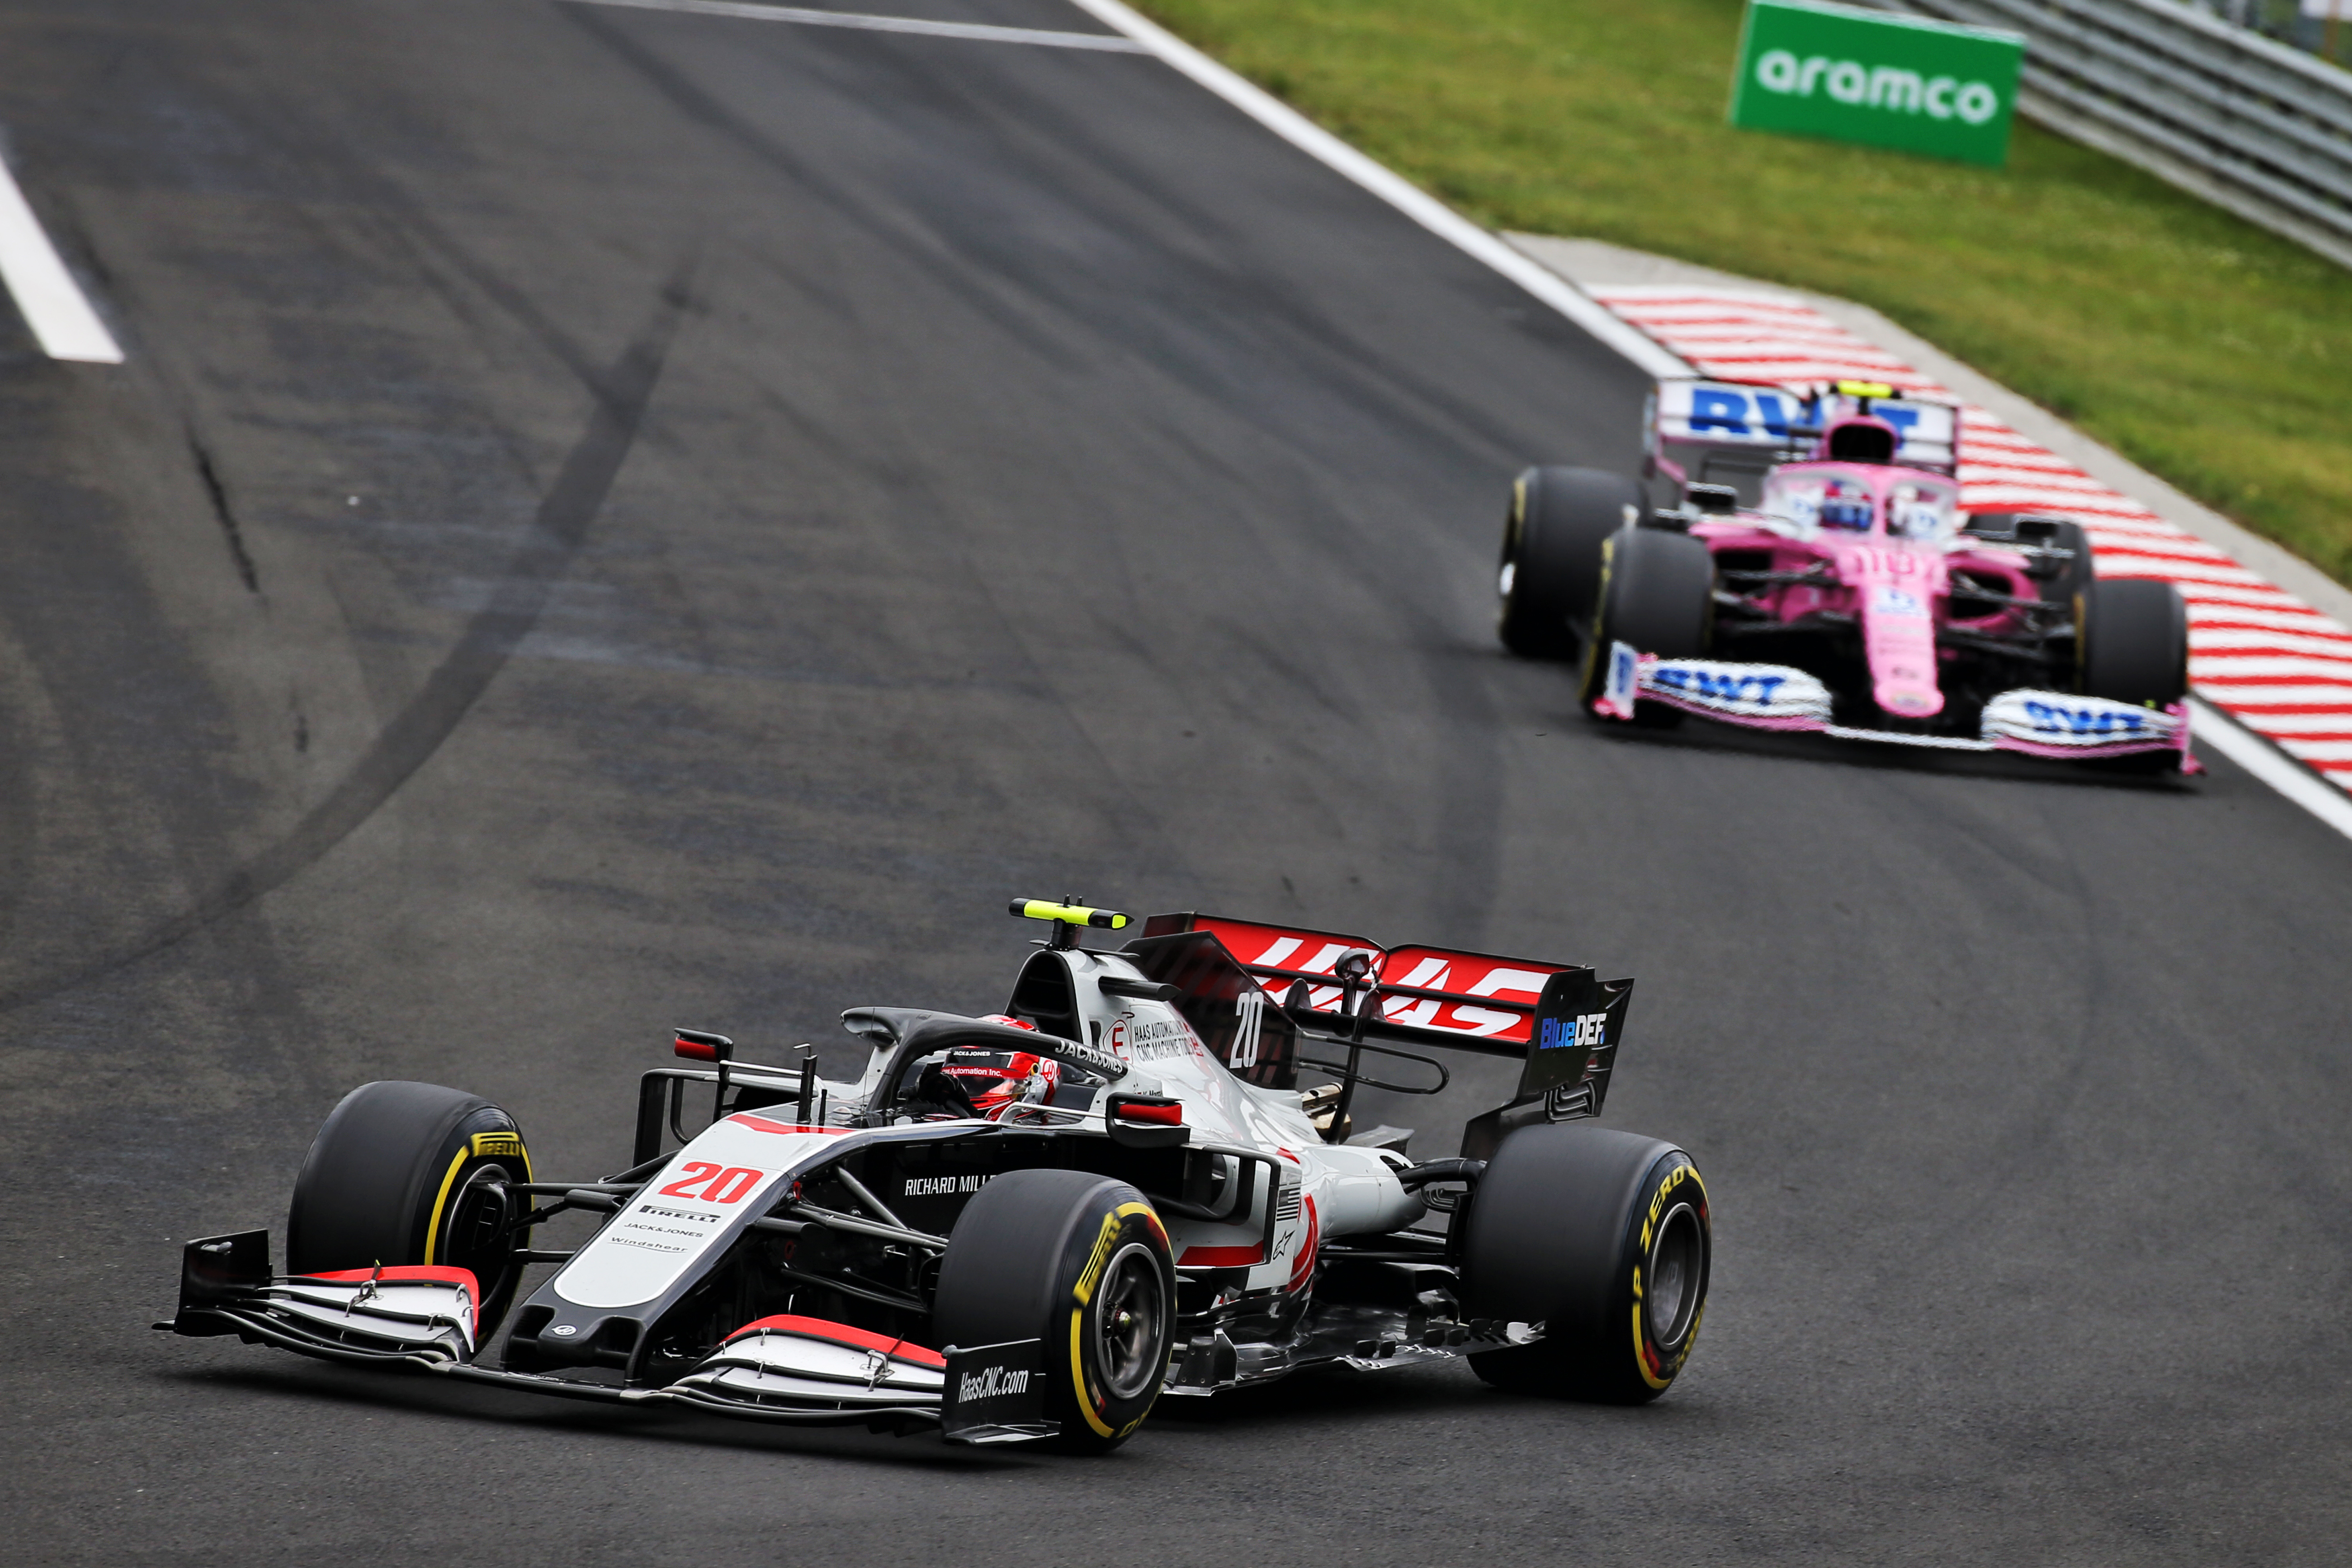 Kevin Magnussen Haas Hungarian Grand Prix 2020